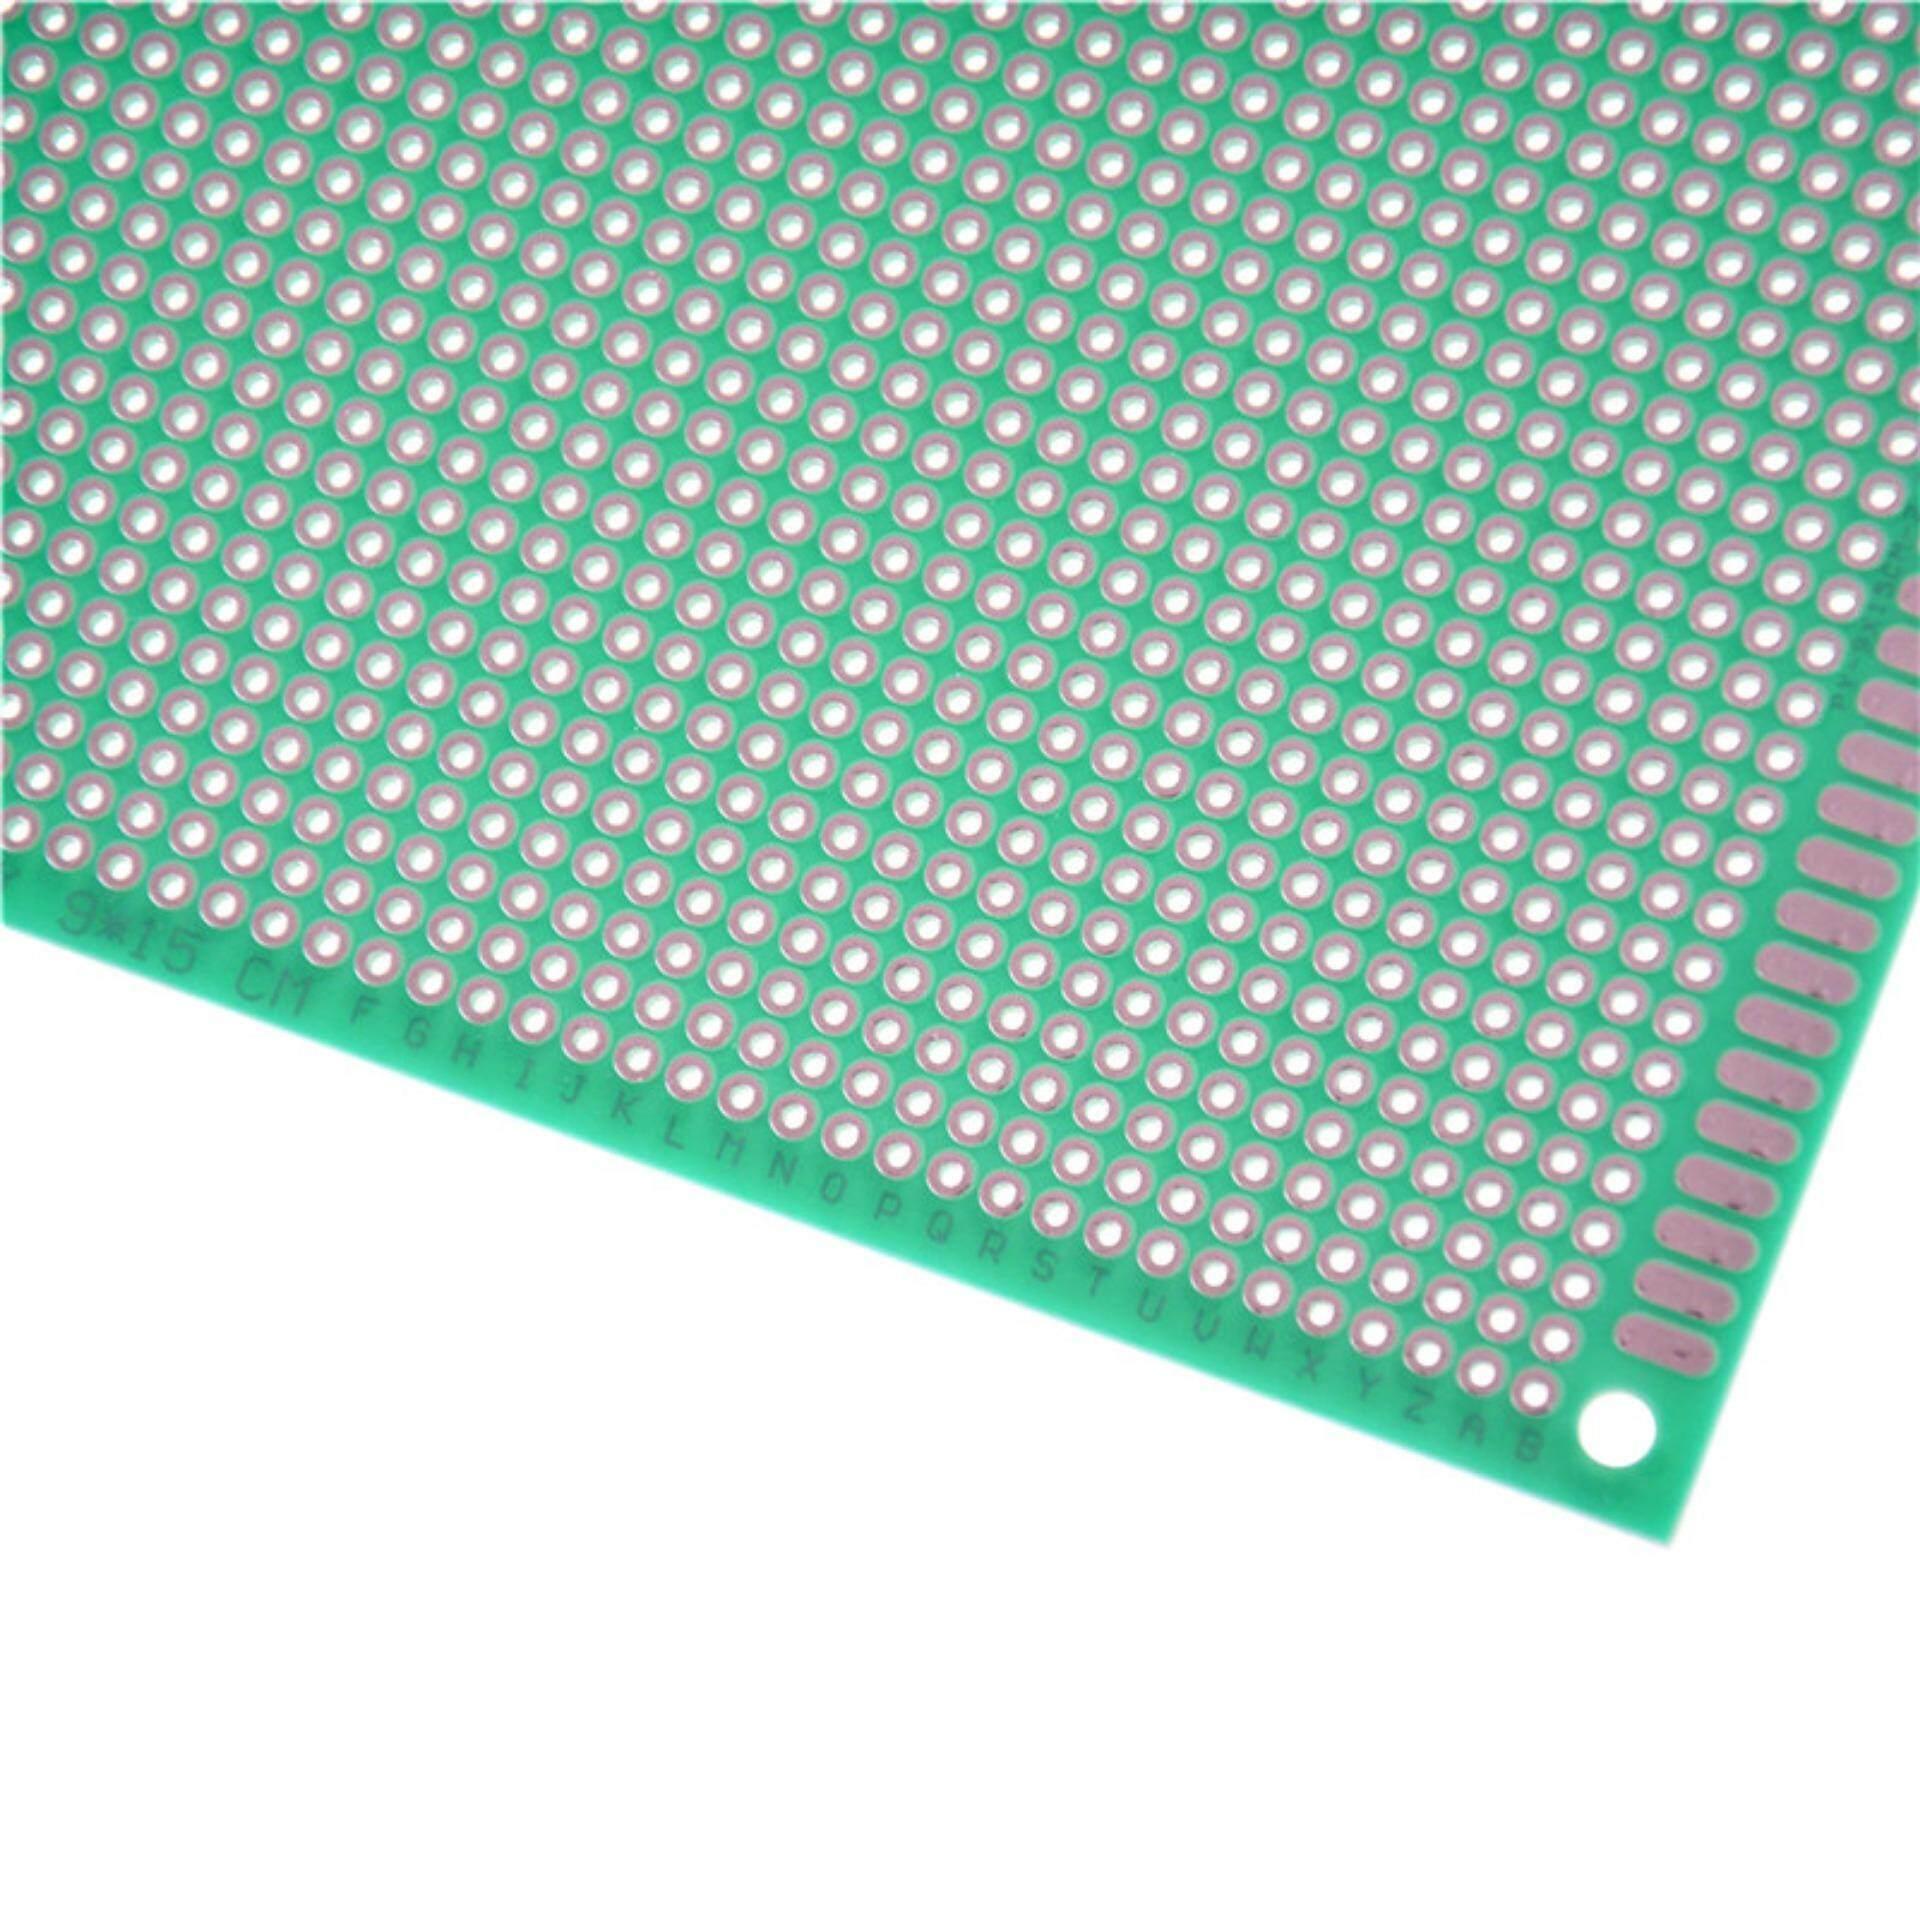 Fitur 915cm Fiber Green Single Side Prototype Circuit Tinned 7cm Diy Paper Pcb Universal Experiment Matrix Board Through Hole